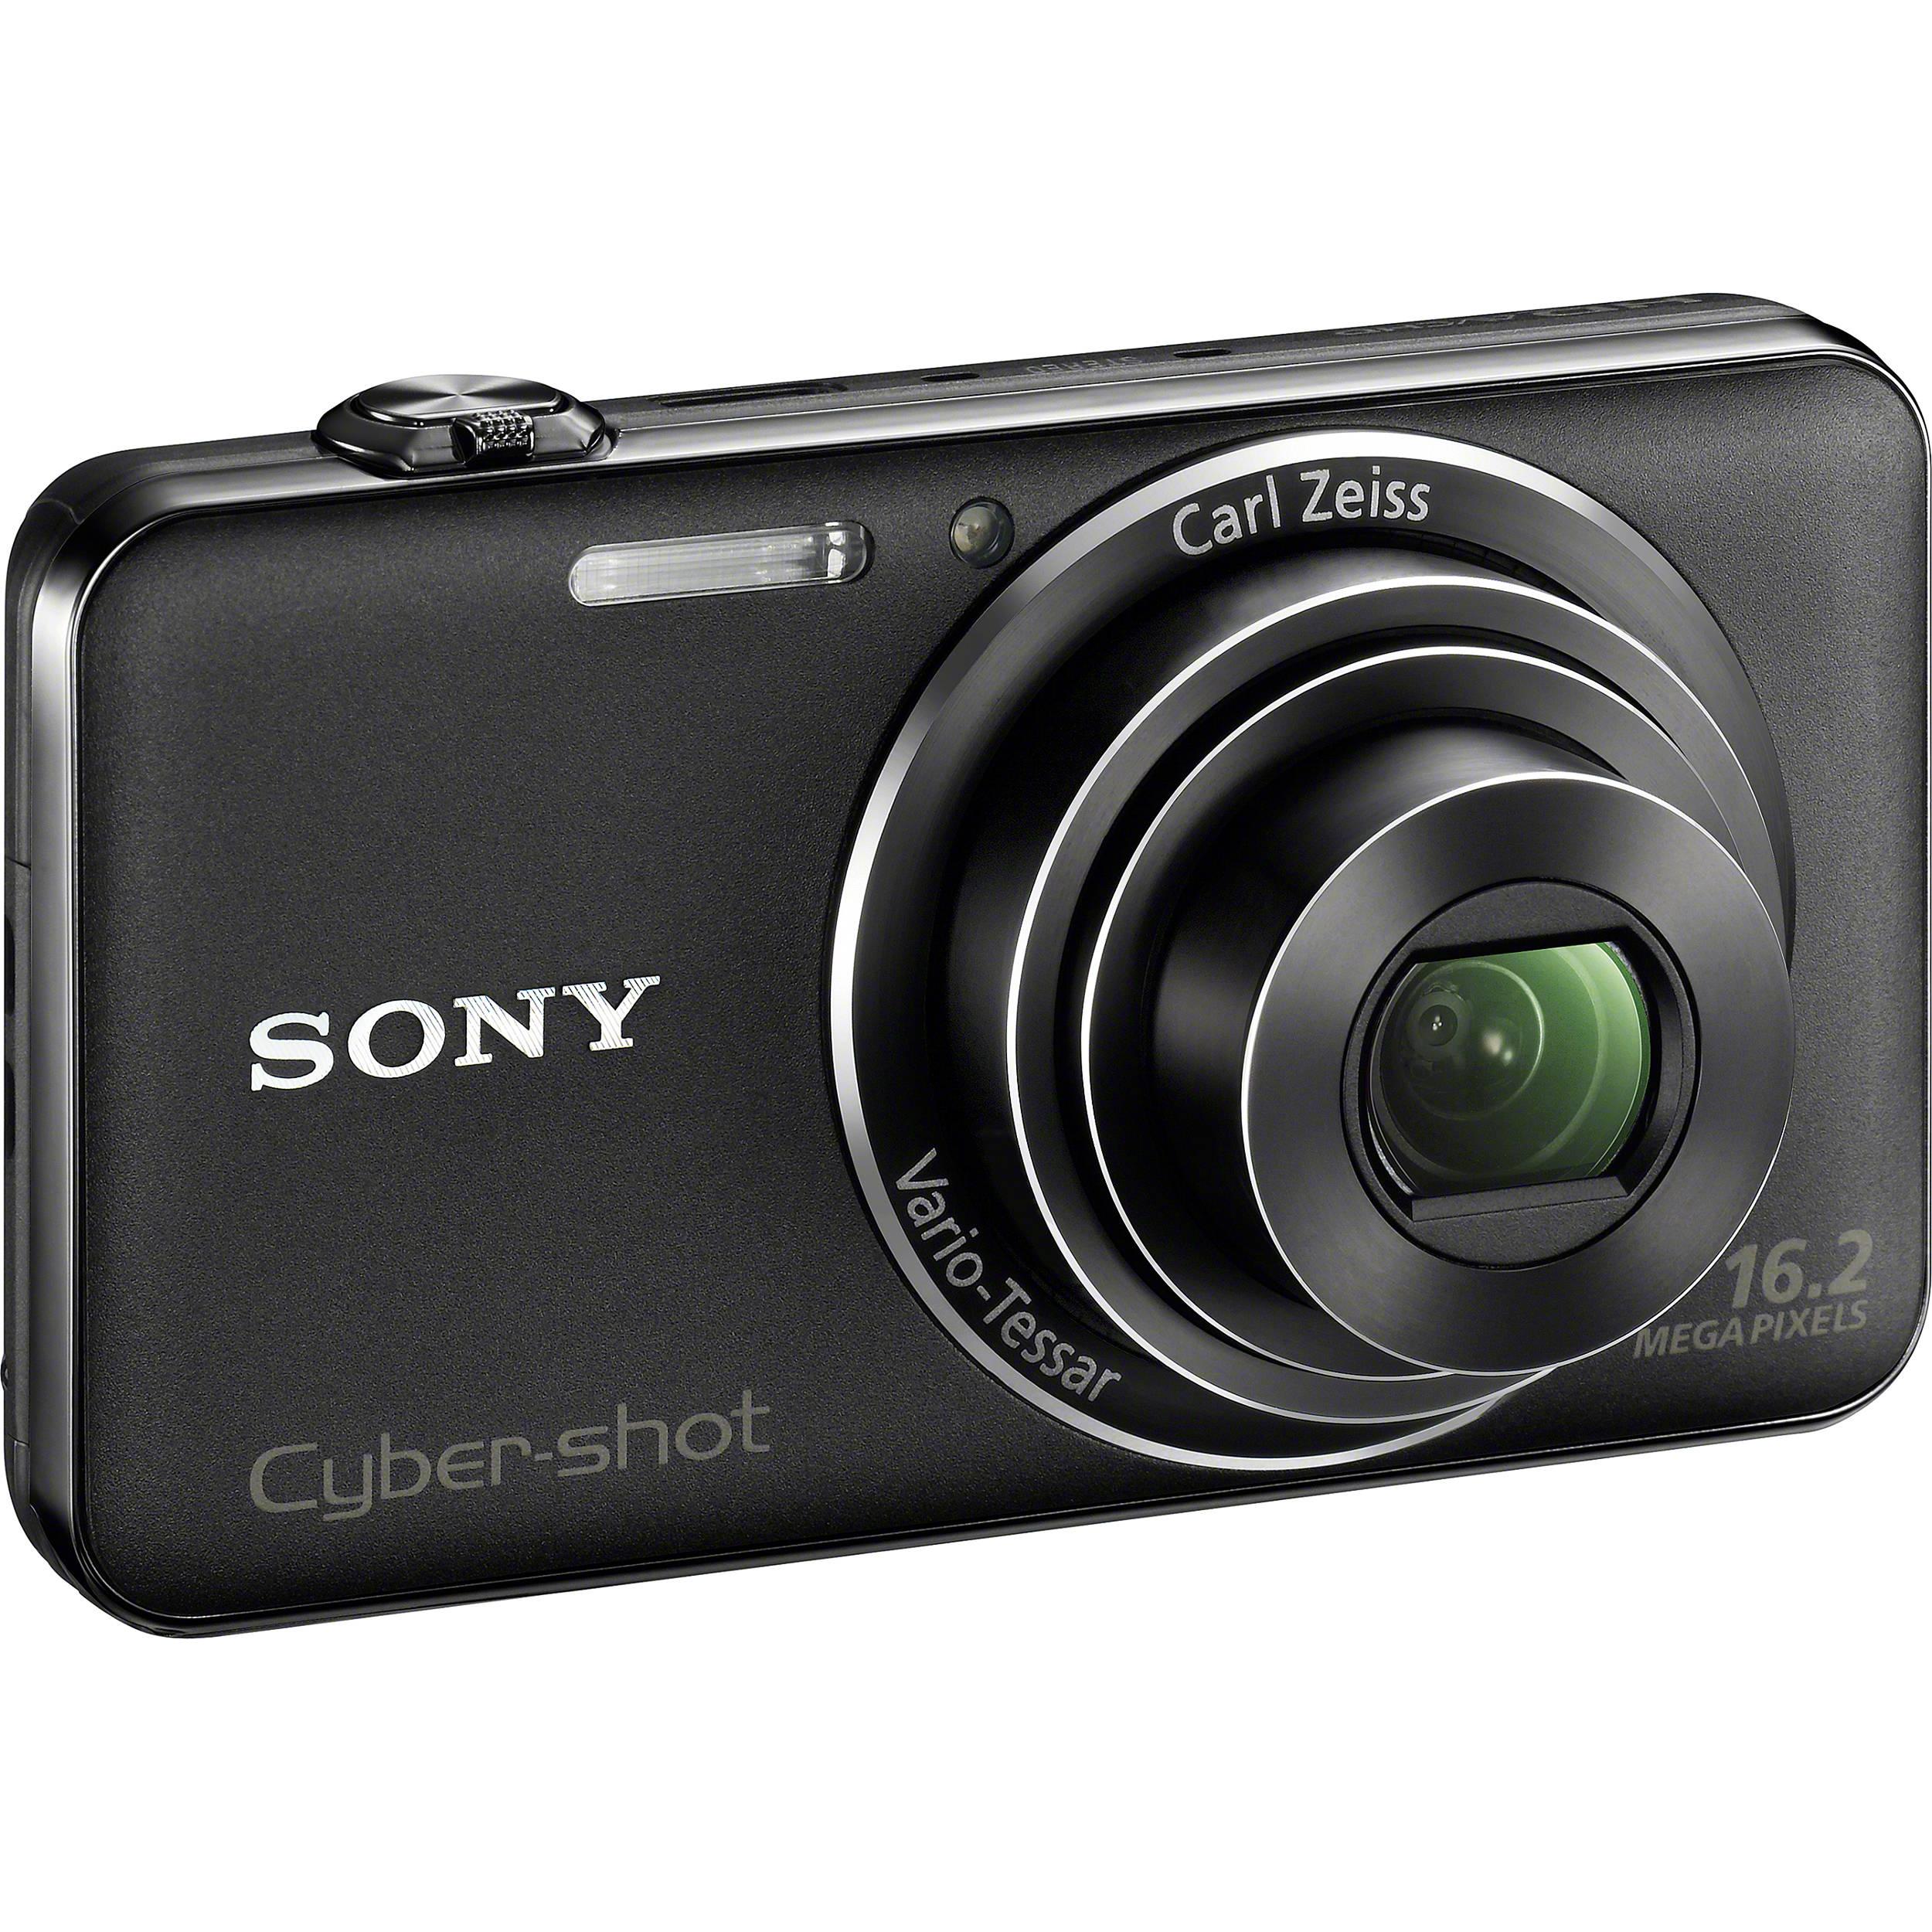 sony cyber shot dsc wx50 digital camera black dscwx50 b b h rh bhphotovideo com sony cyber shot dsc-hx300 instruction manual sony cyber shot 1080 user manual